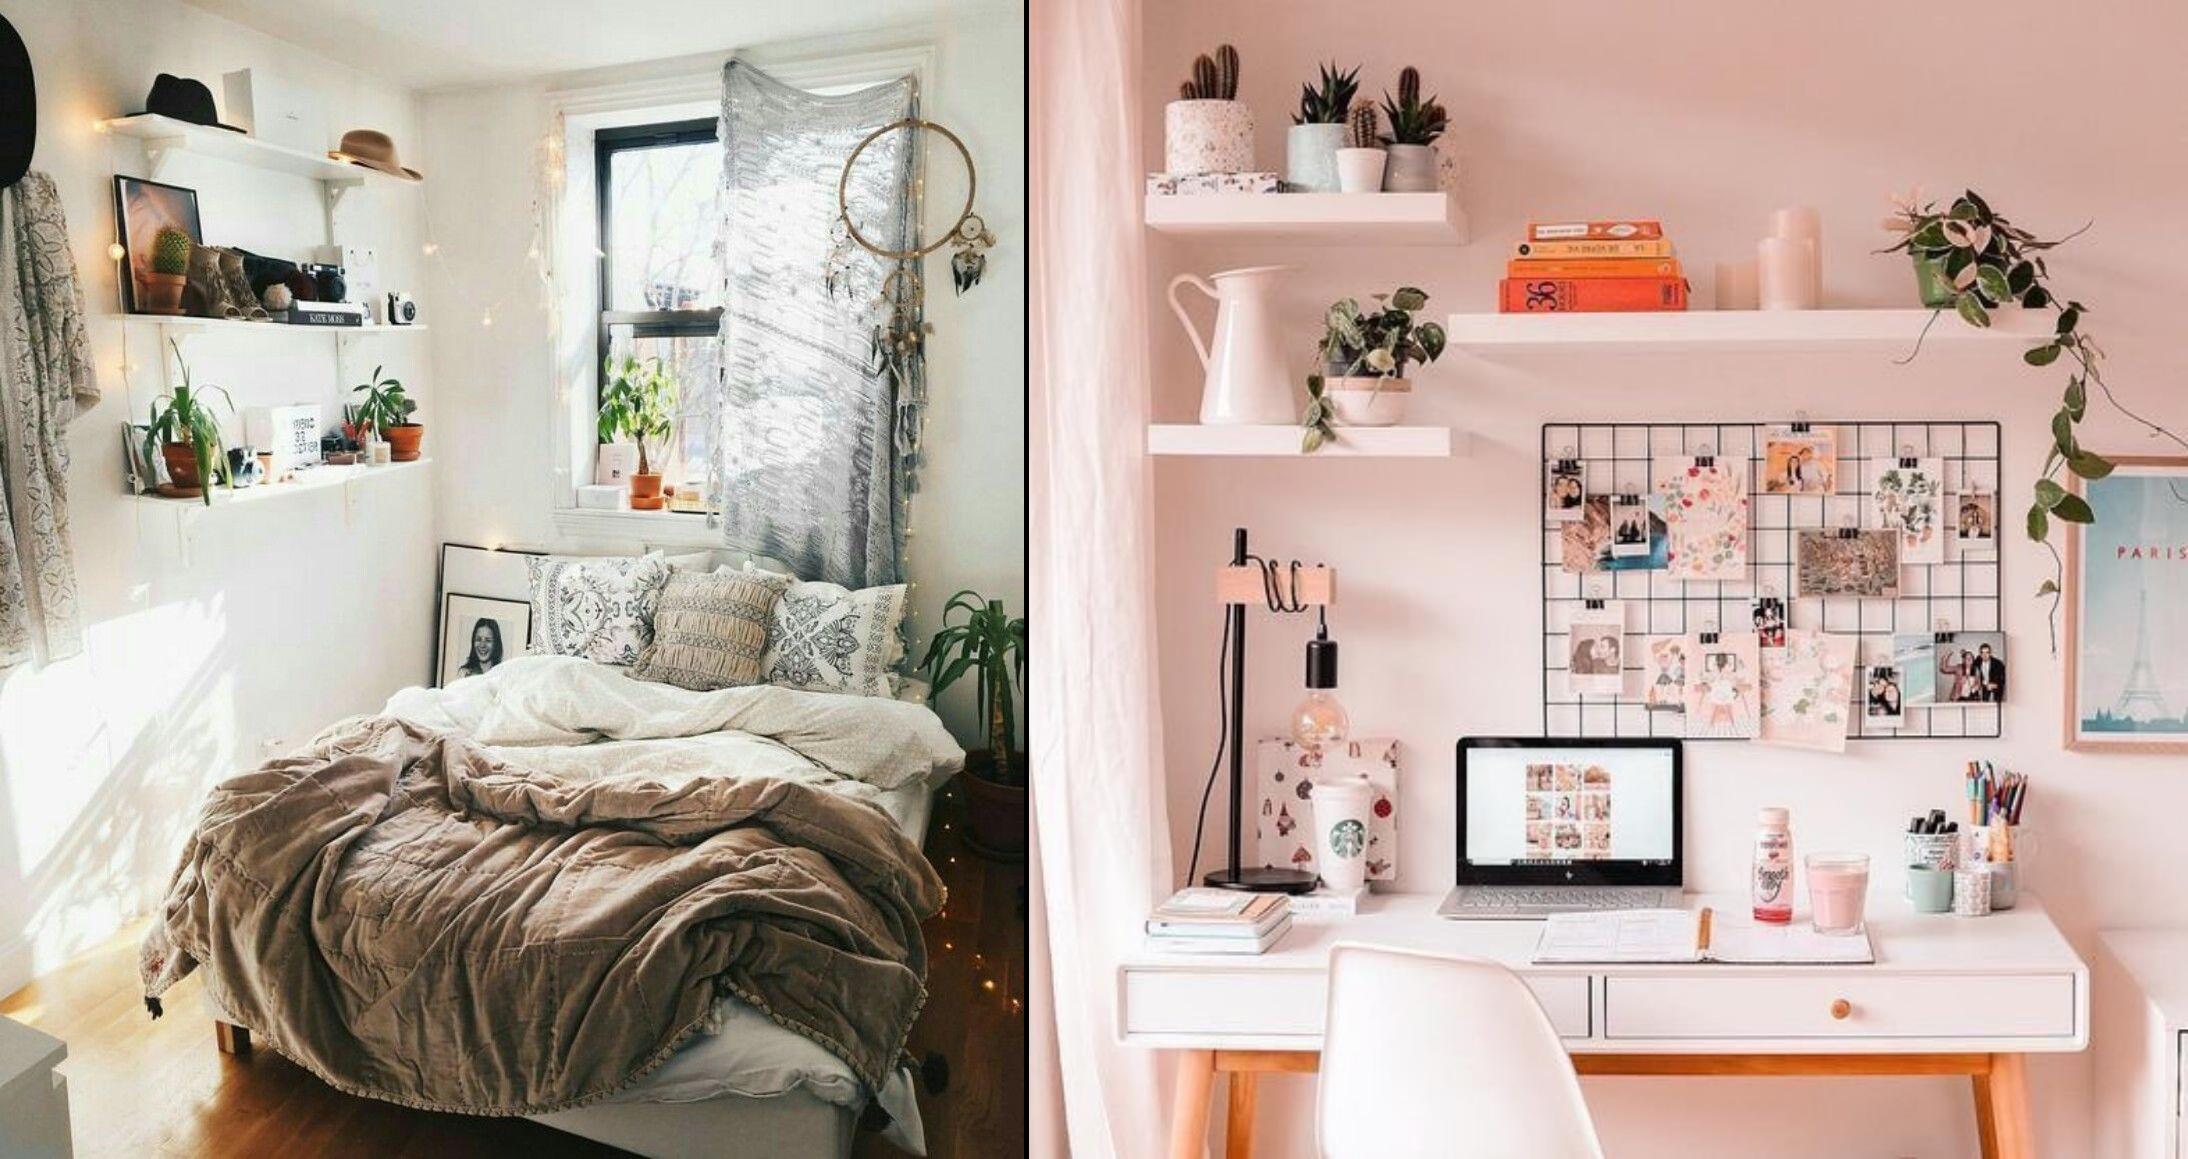 10 Ornamen Simpel Harga Bersahabat Untuk Menghias Kamar Ala Pinterest Estetis Banget